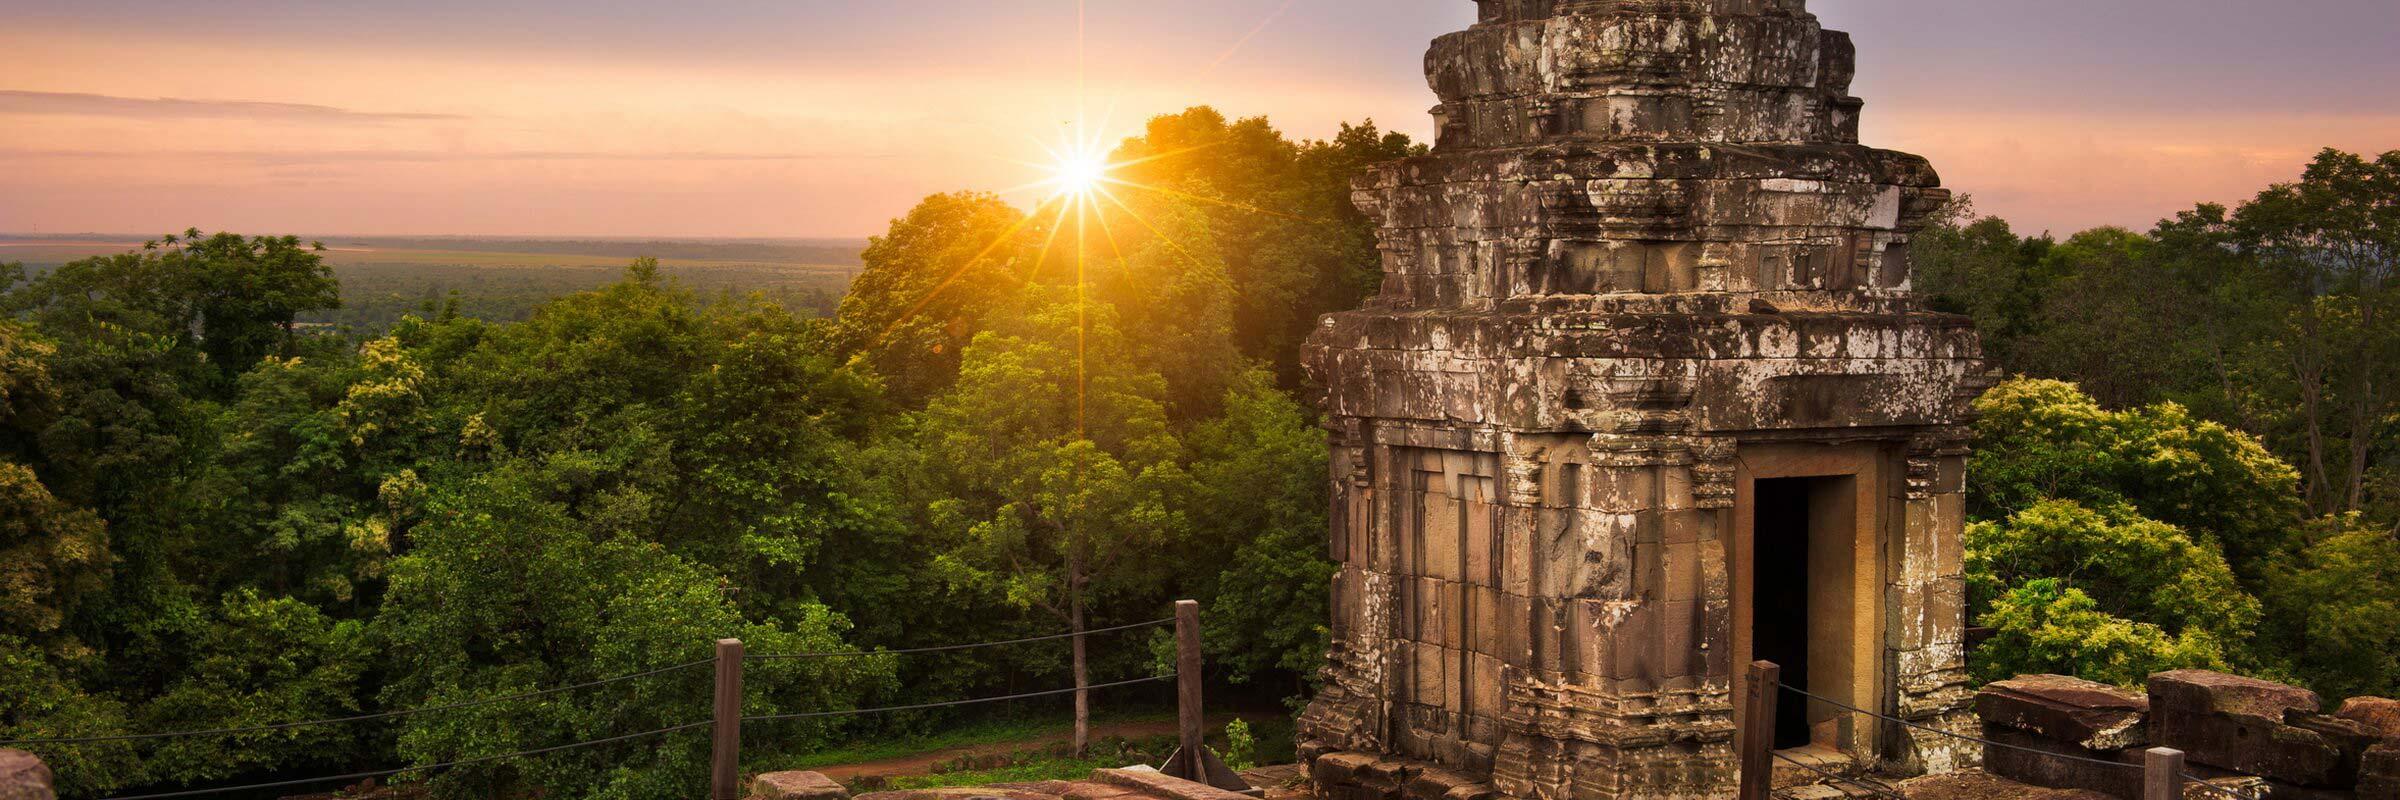 Sonnenuntergang am Pyramidentempel Phnom Bakheng nahe Siem Reap in Kambodscha